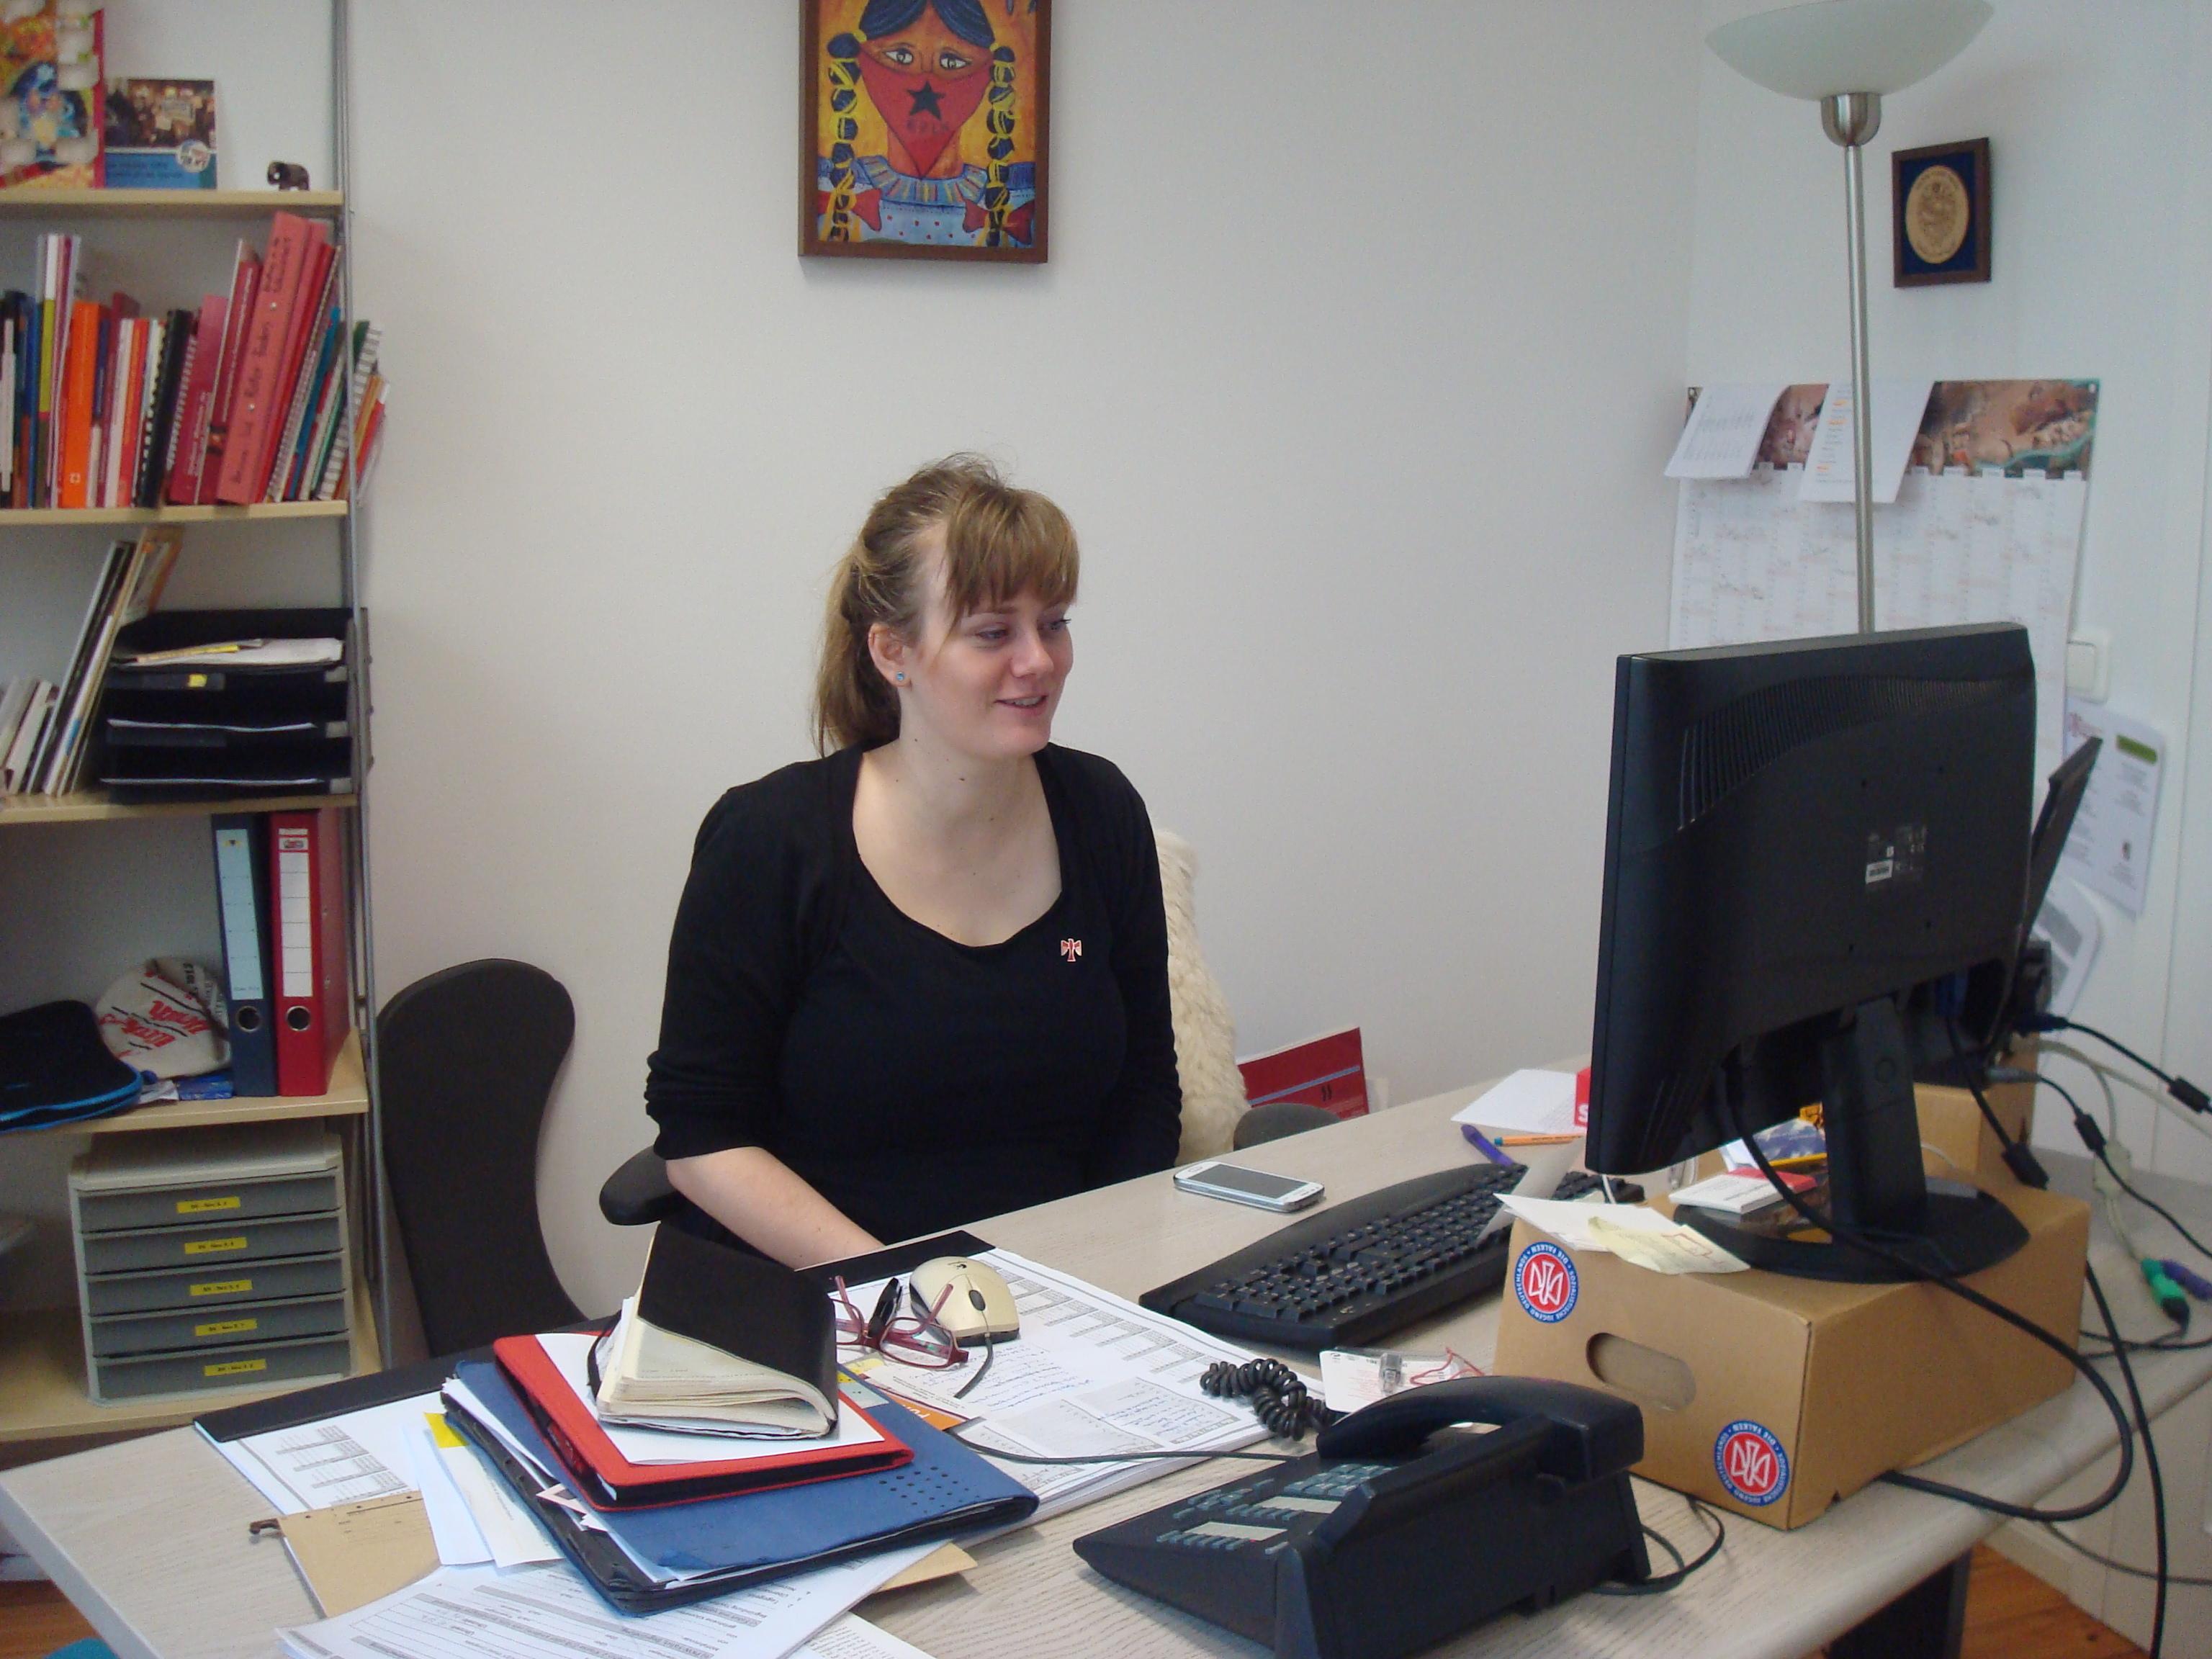 Josephine Tischner leads the young German socialist movement Die Falken based in Berlin.